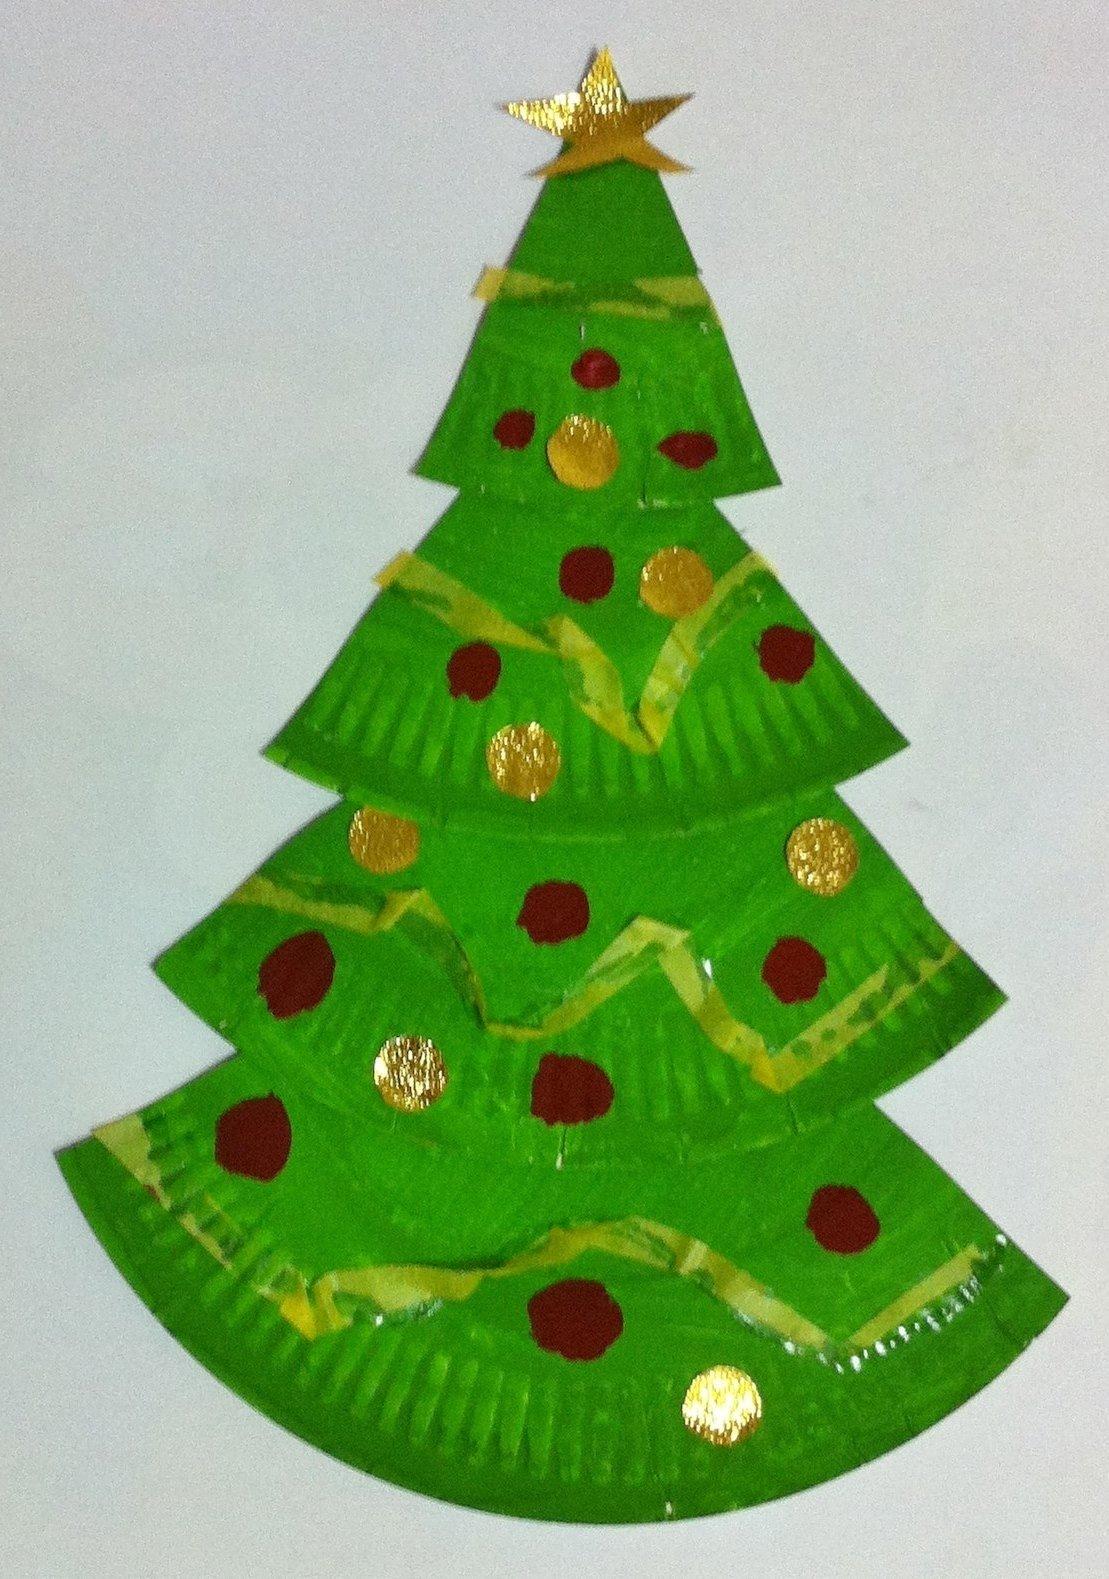 10 Stylish Christmas Craft Ideas For Kids To Make easy paper christmas crafts kids find craft ideas 2 2021